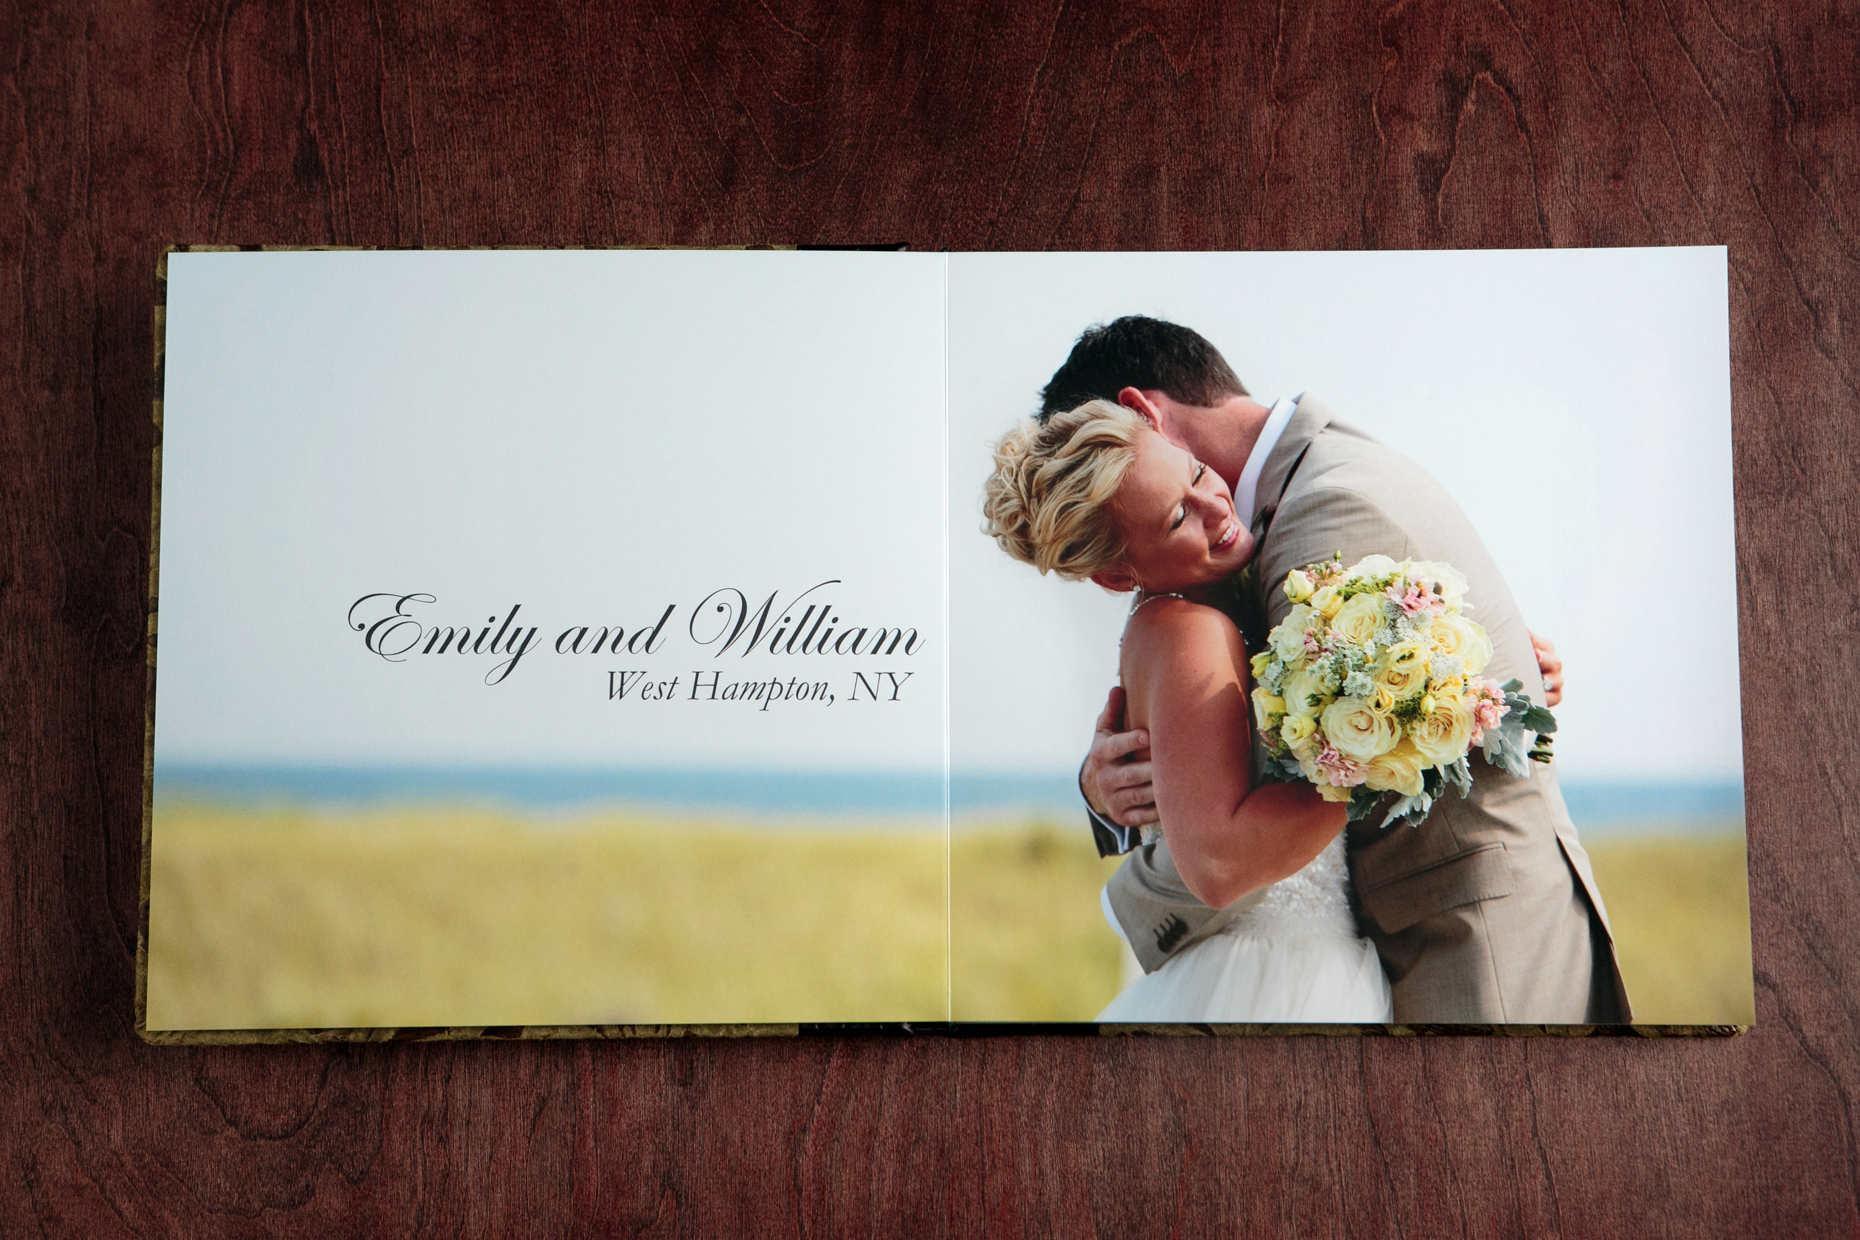 Wedding Albums Modern Wedding graphy by Denise Chastain